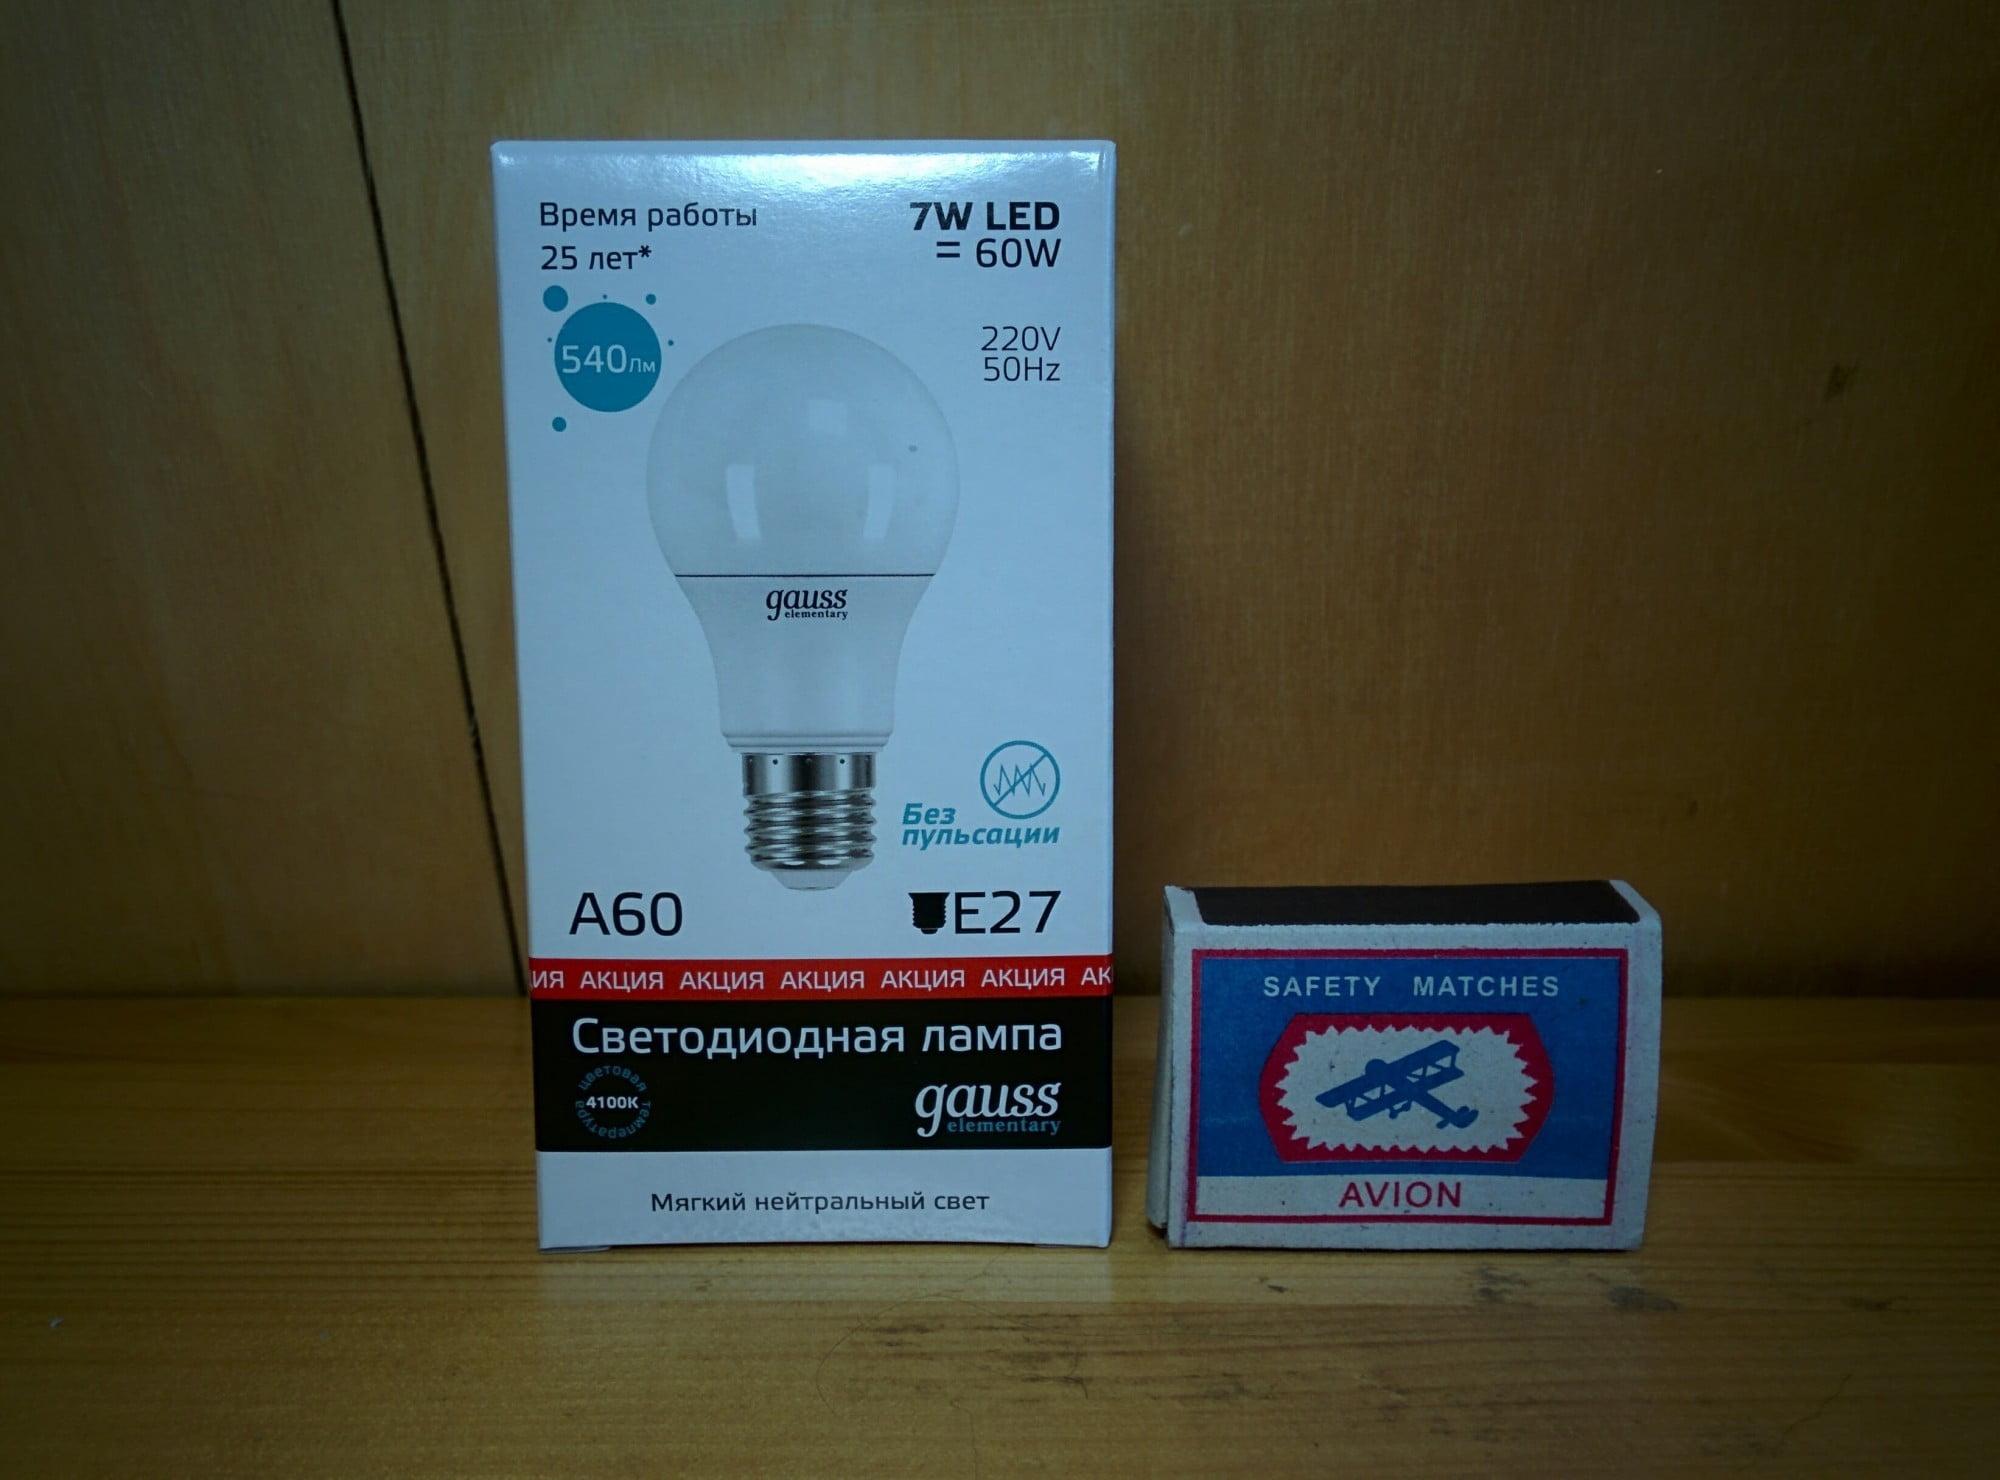 Gauss LED A60 7W E27 4100K упаковка